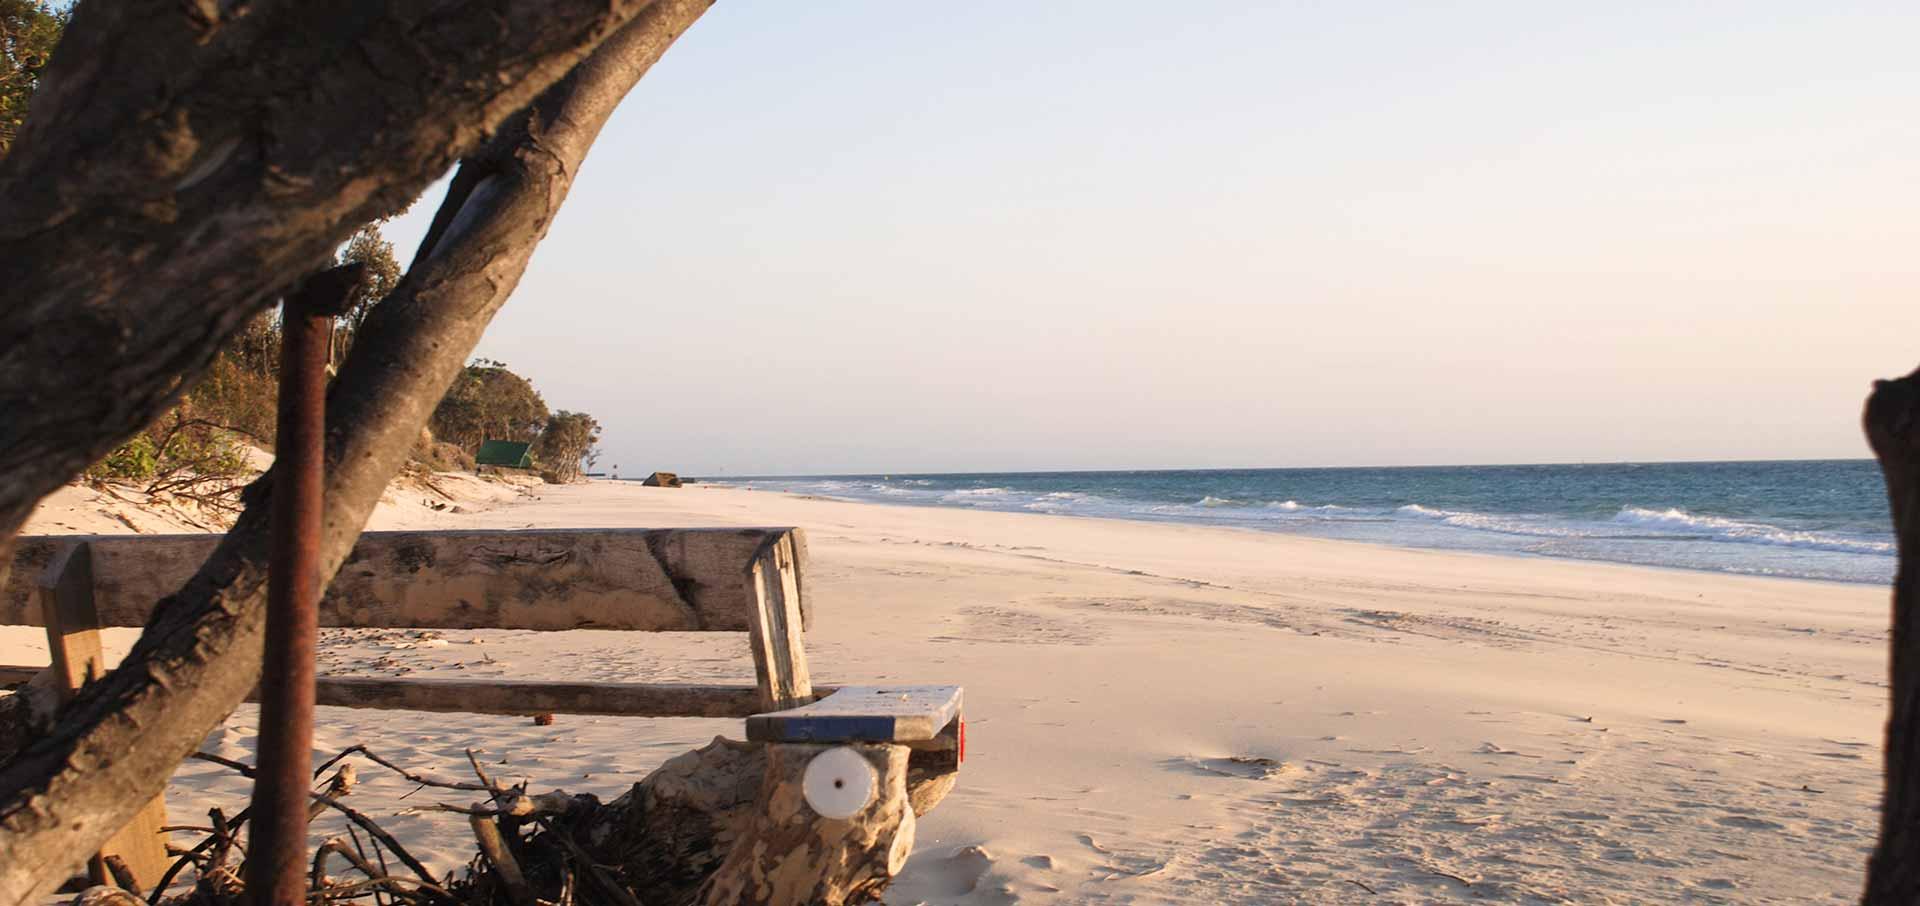 holiday accommodation at moreton island moreton bay boat. Black Bedroom Furniture Sets. Home Design Ideas